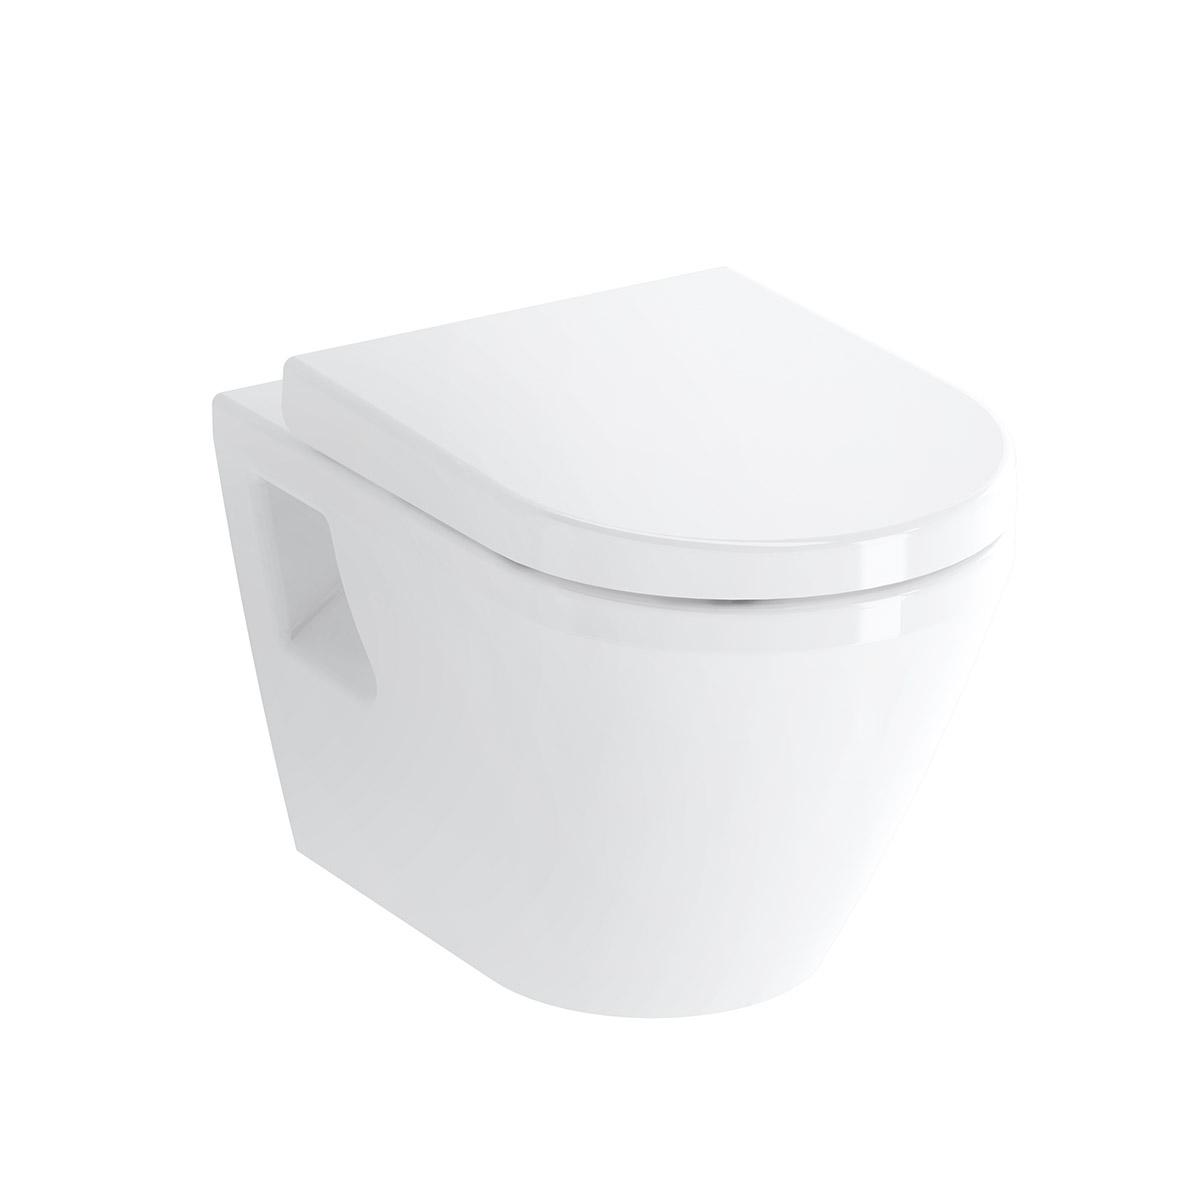 Integra Wand-WC mit Bidetfunktion, Weiß